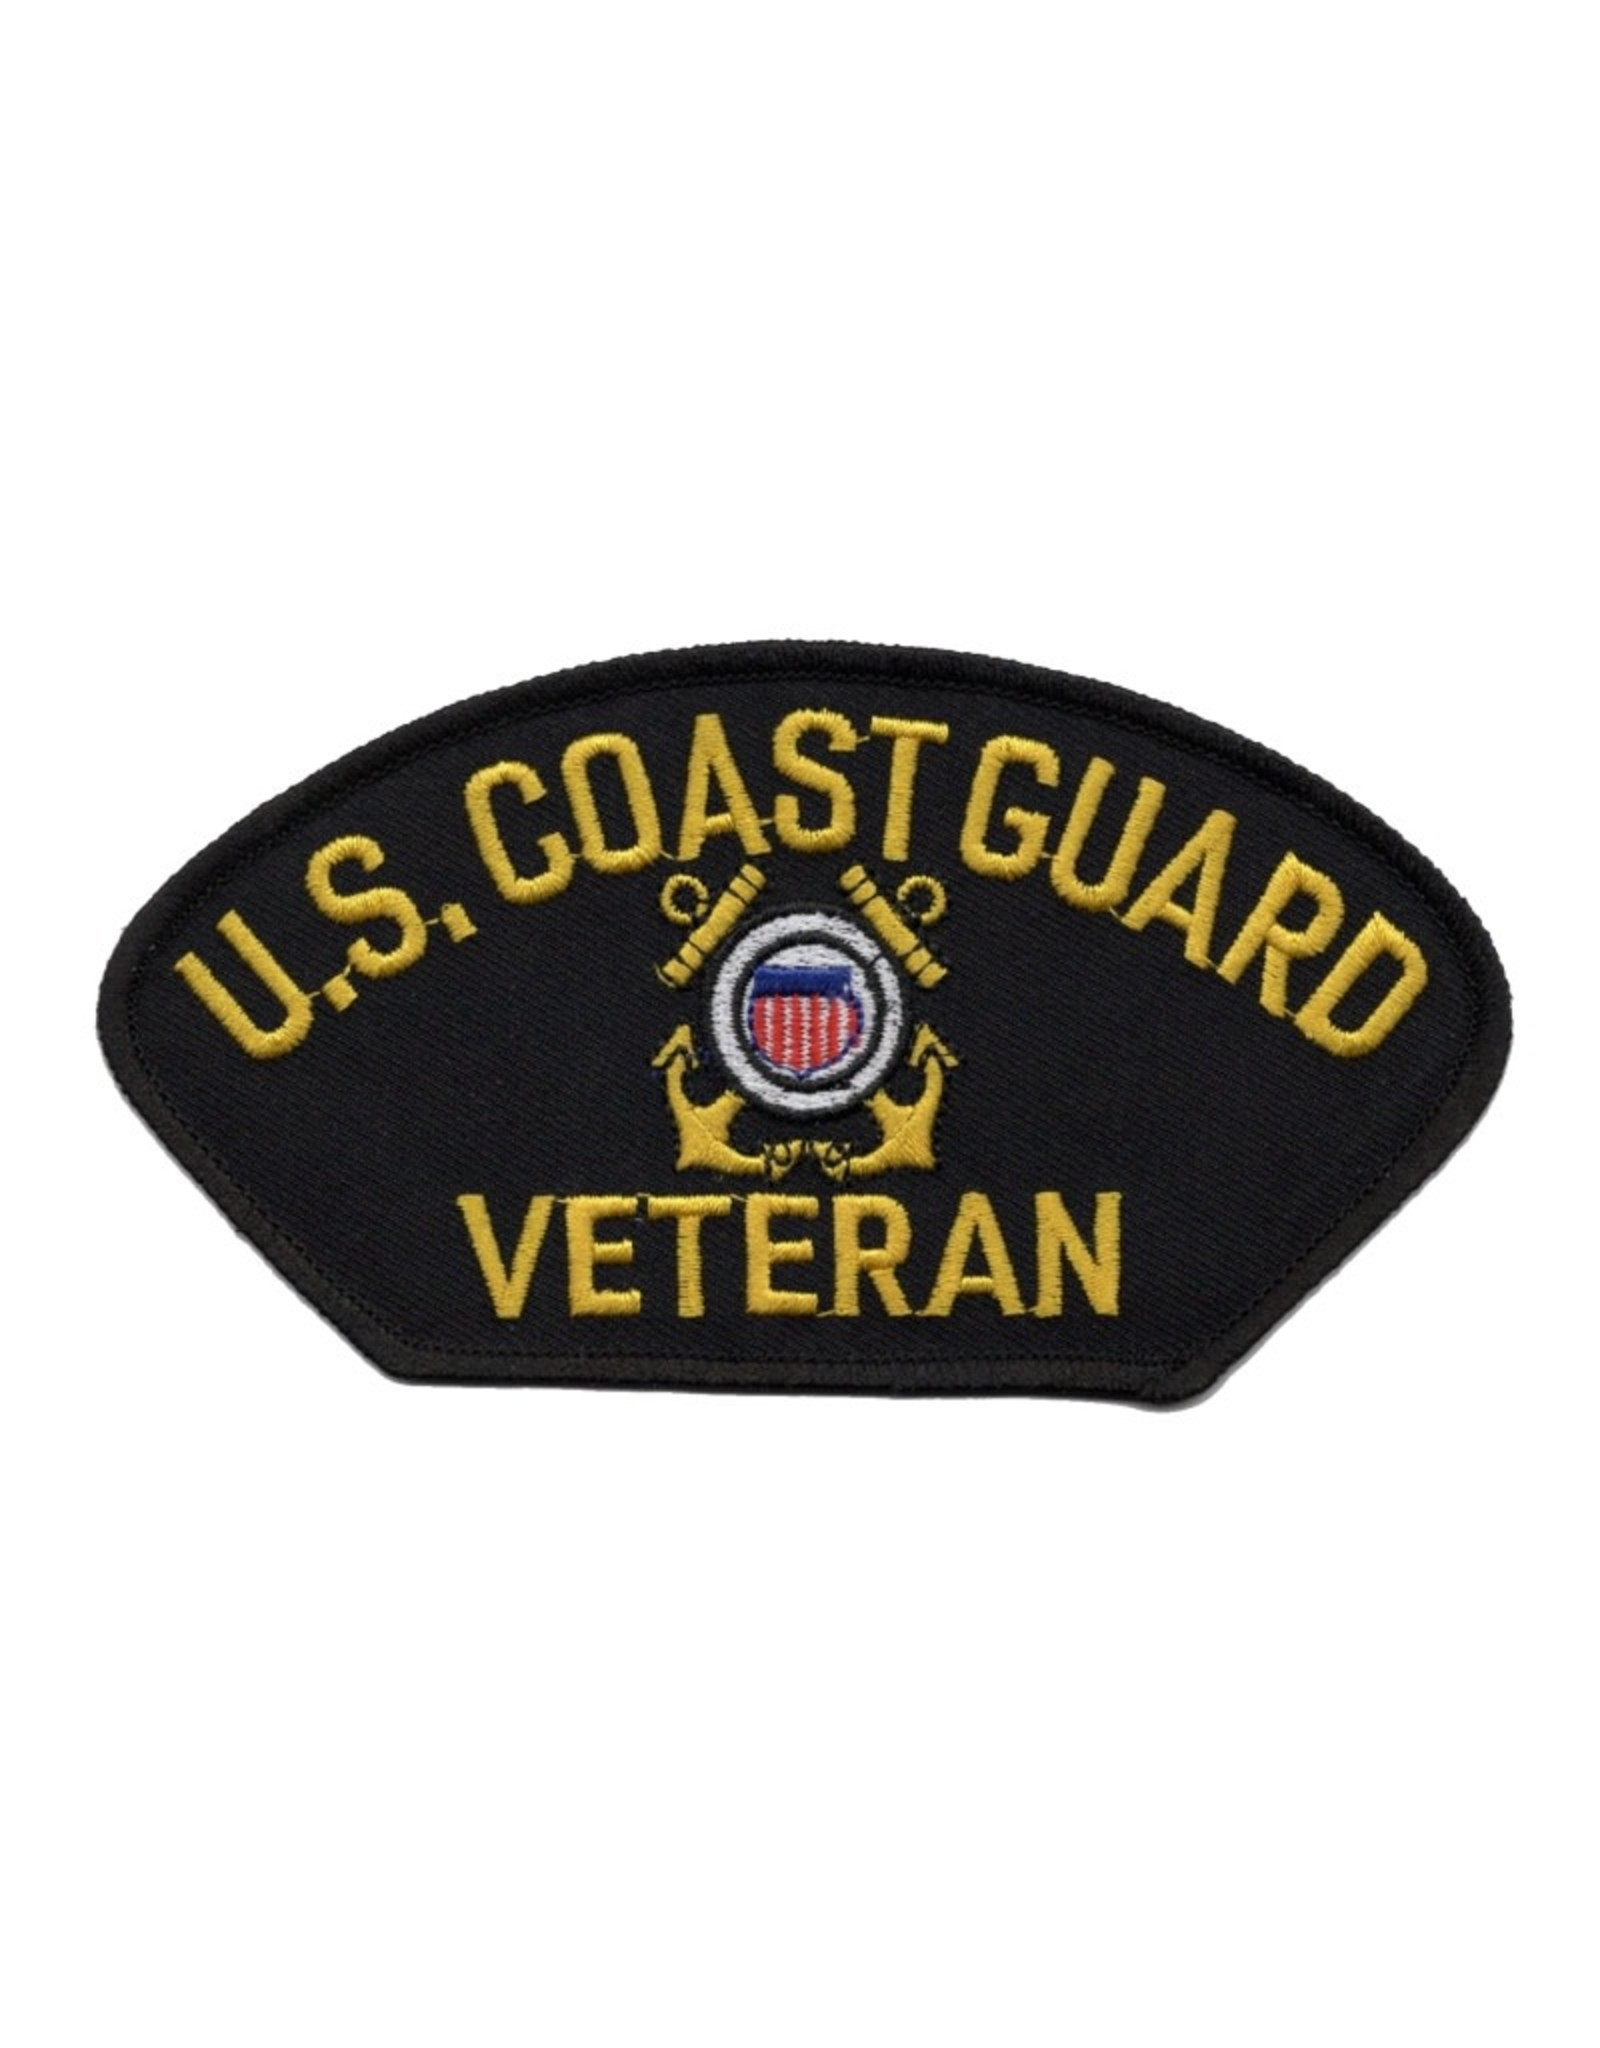 "MidMil Embroidered U.S. Coast Guard Veteran Patch with Emblem 5.2"" wide x 2.8"" high Black"